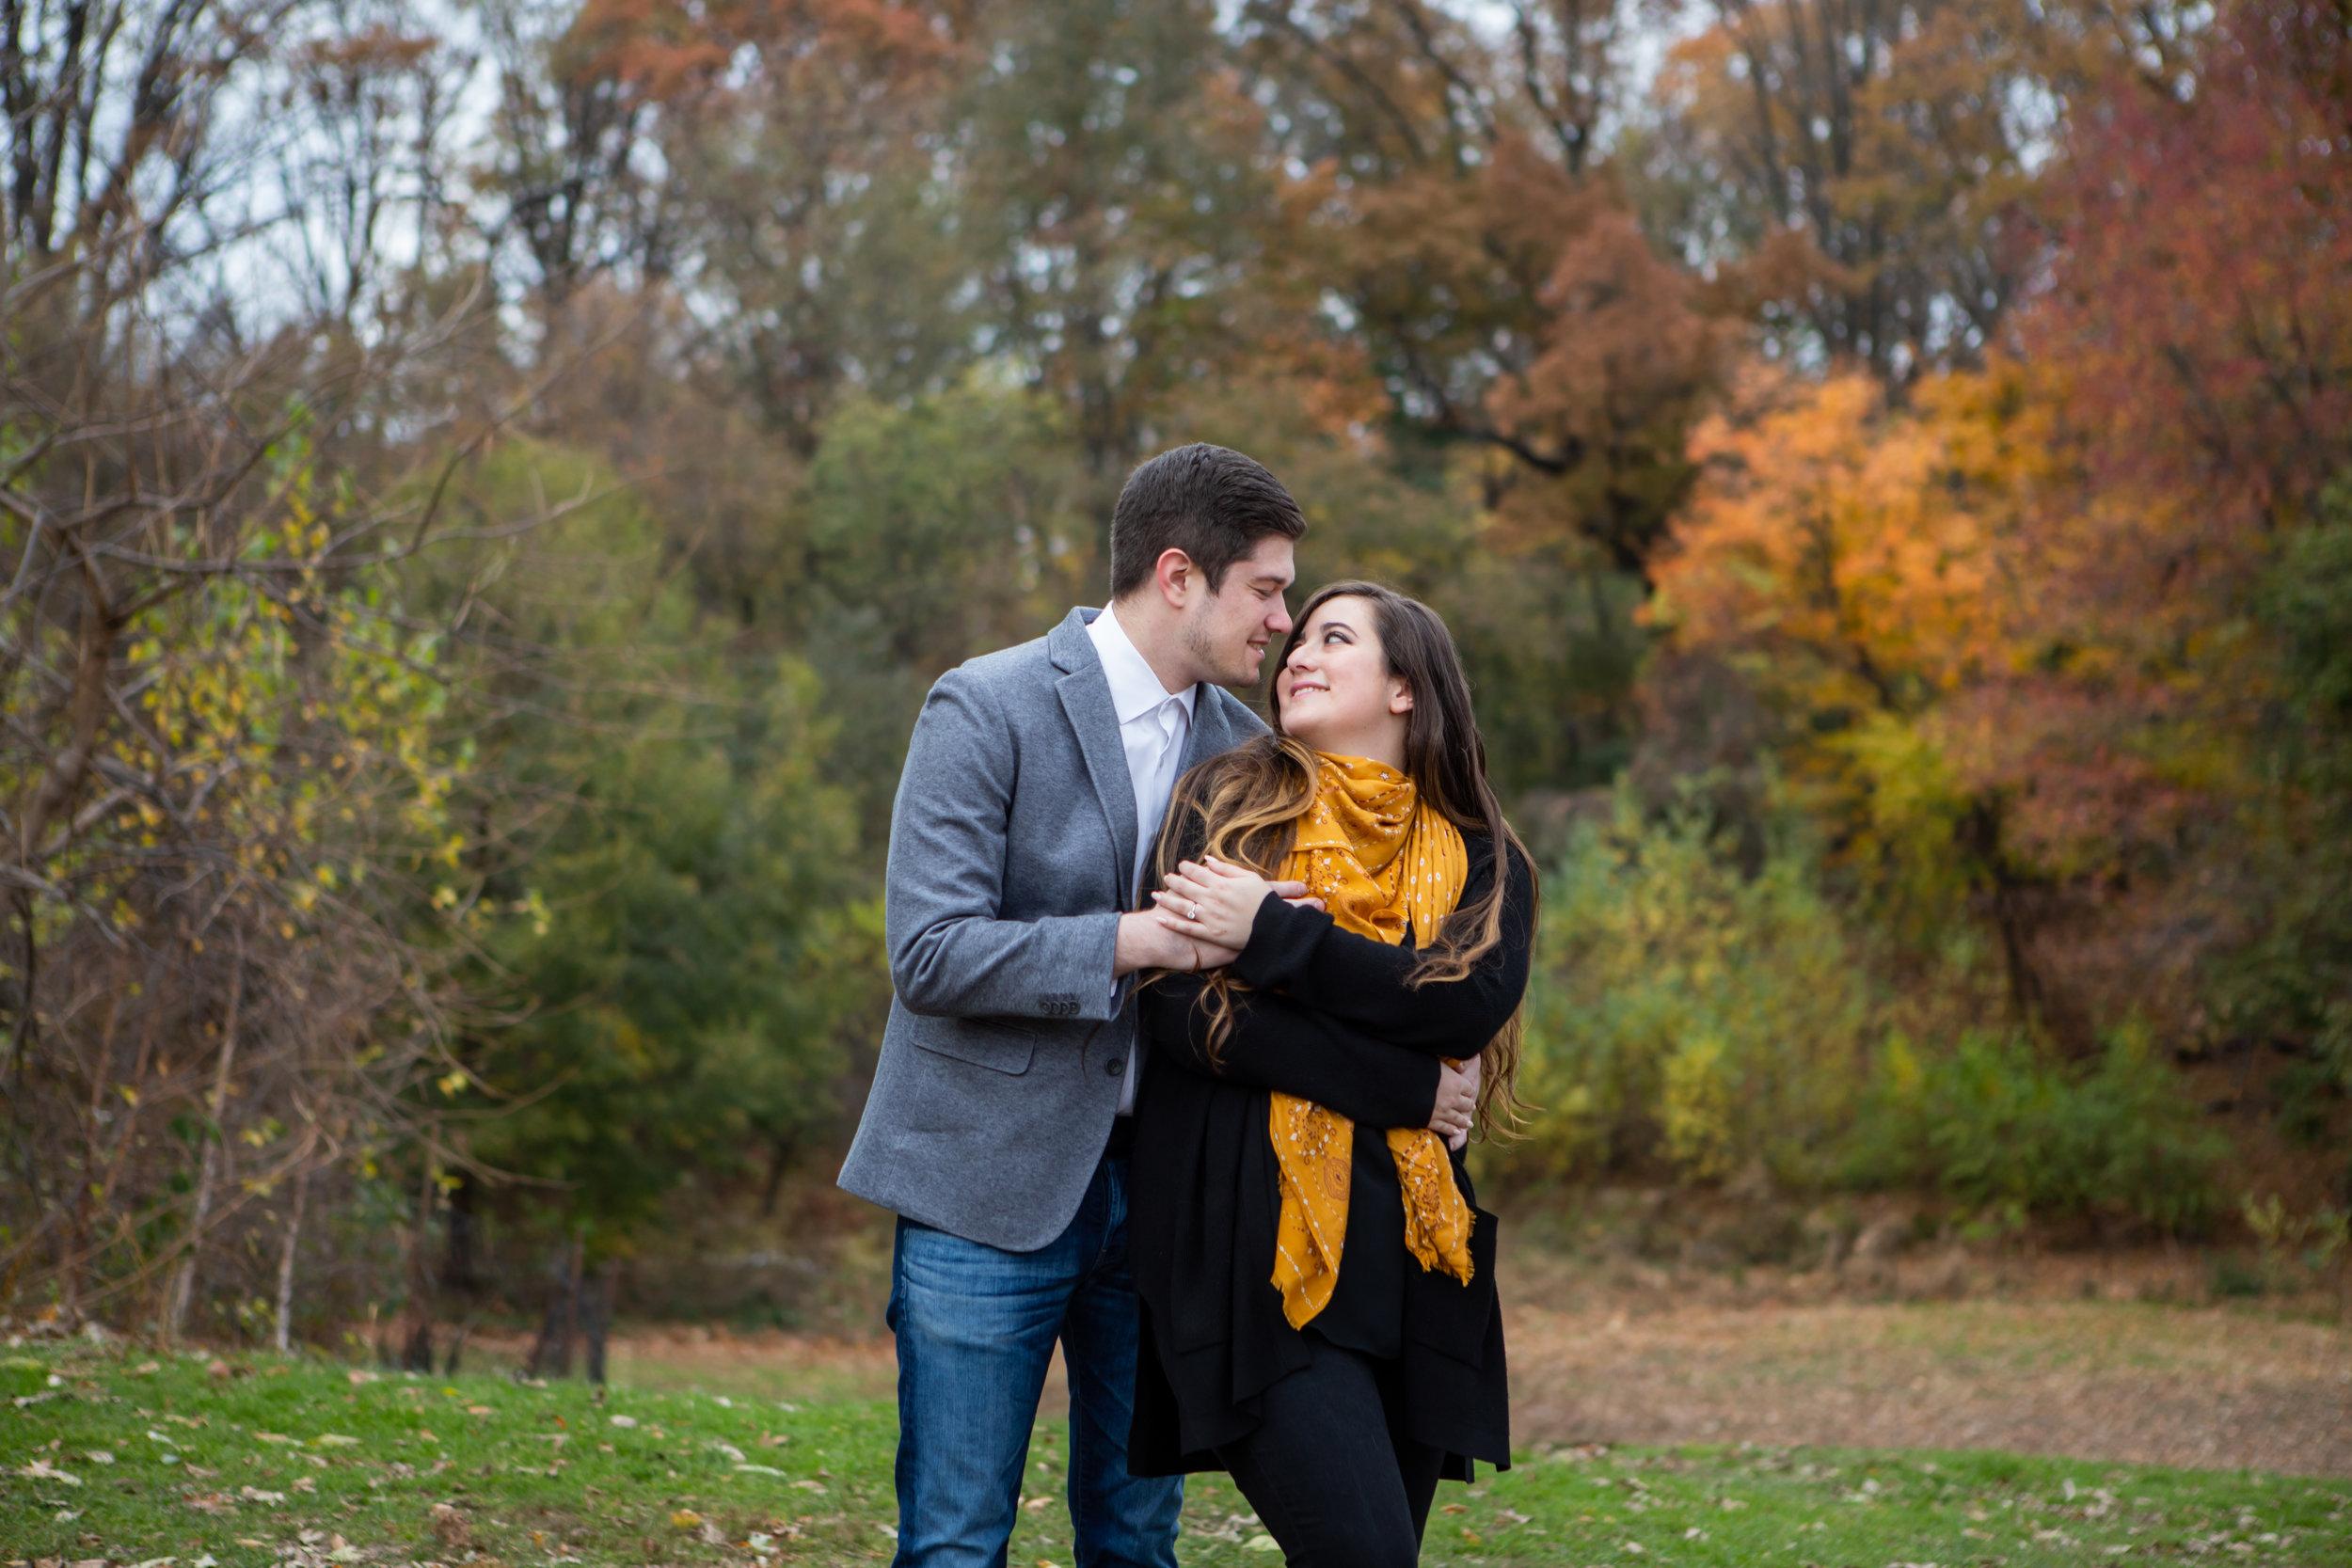 Kate-Alison-Photography-Brooklyn-Autumn-Prospect-Park-Engagement-Session